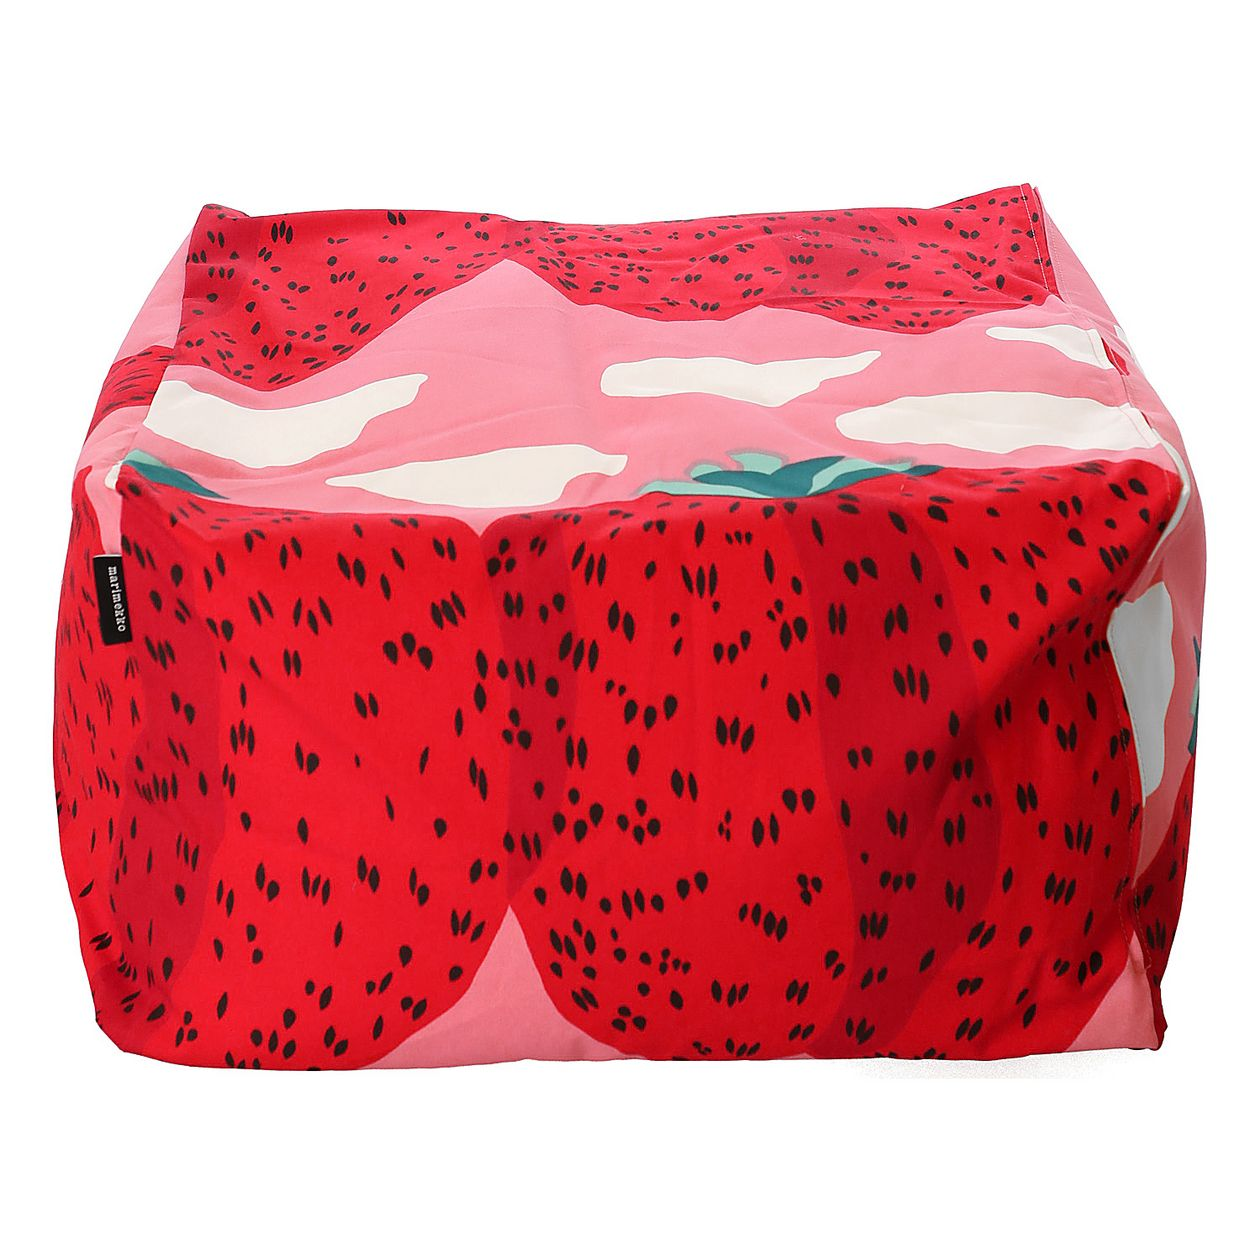 Marimekko Mansikkavuoret Puffi pouf, light pink - red